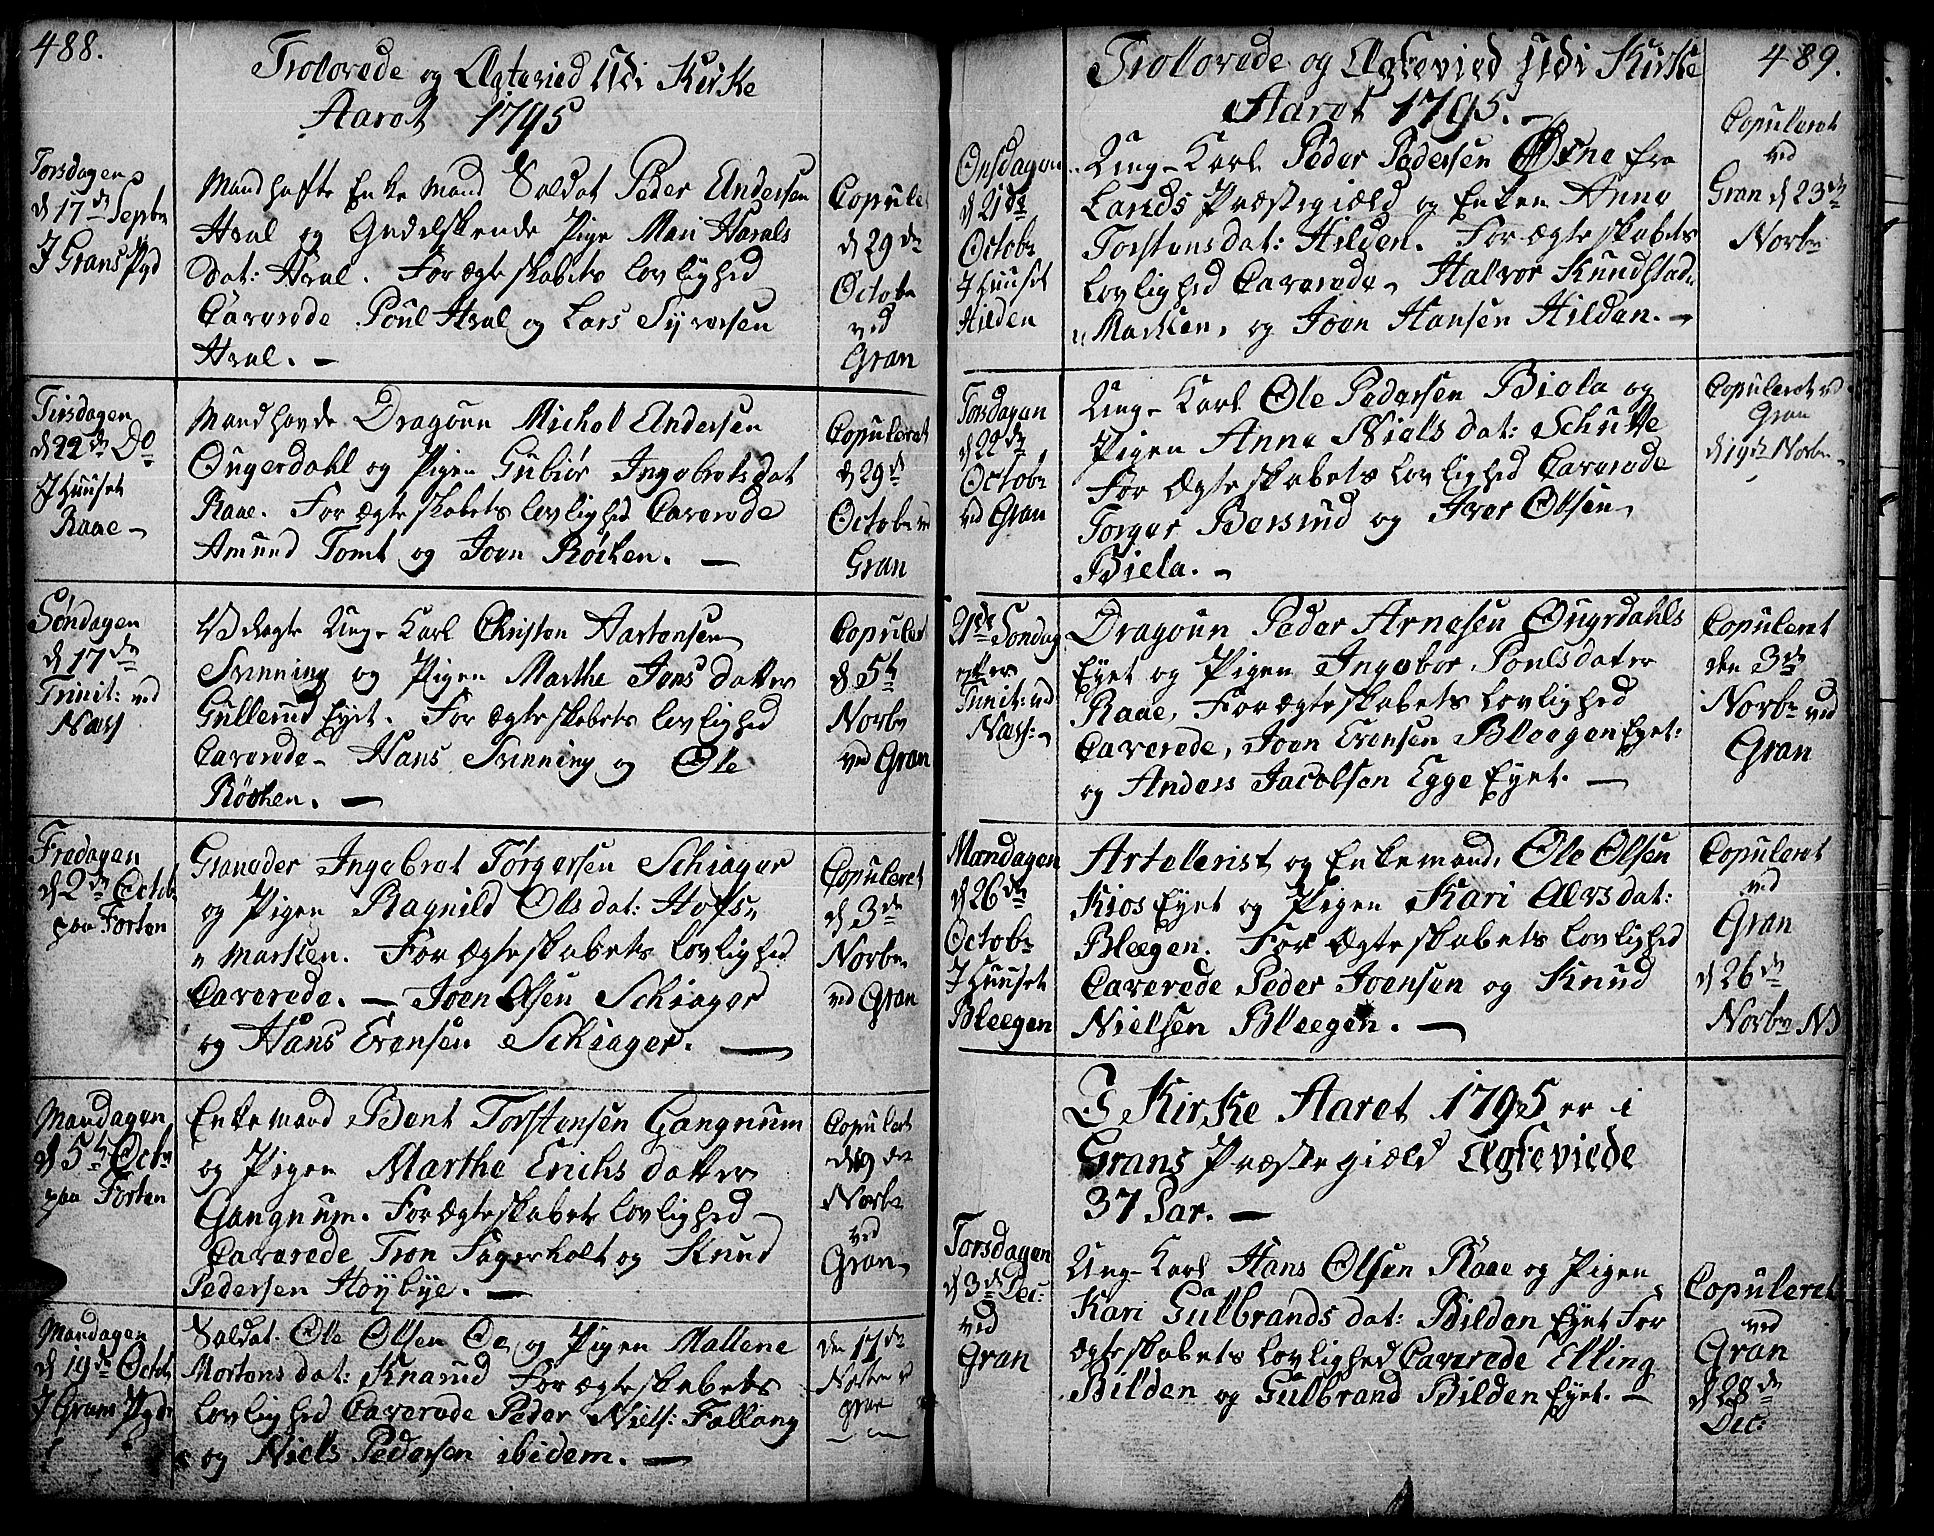 SAH, Gran prestekontor, Ministerialbok nr. 6, 1787-1824, s. 488-489